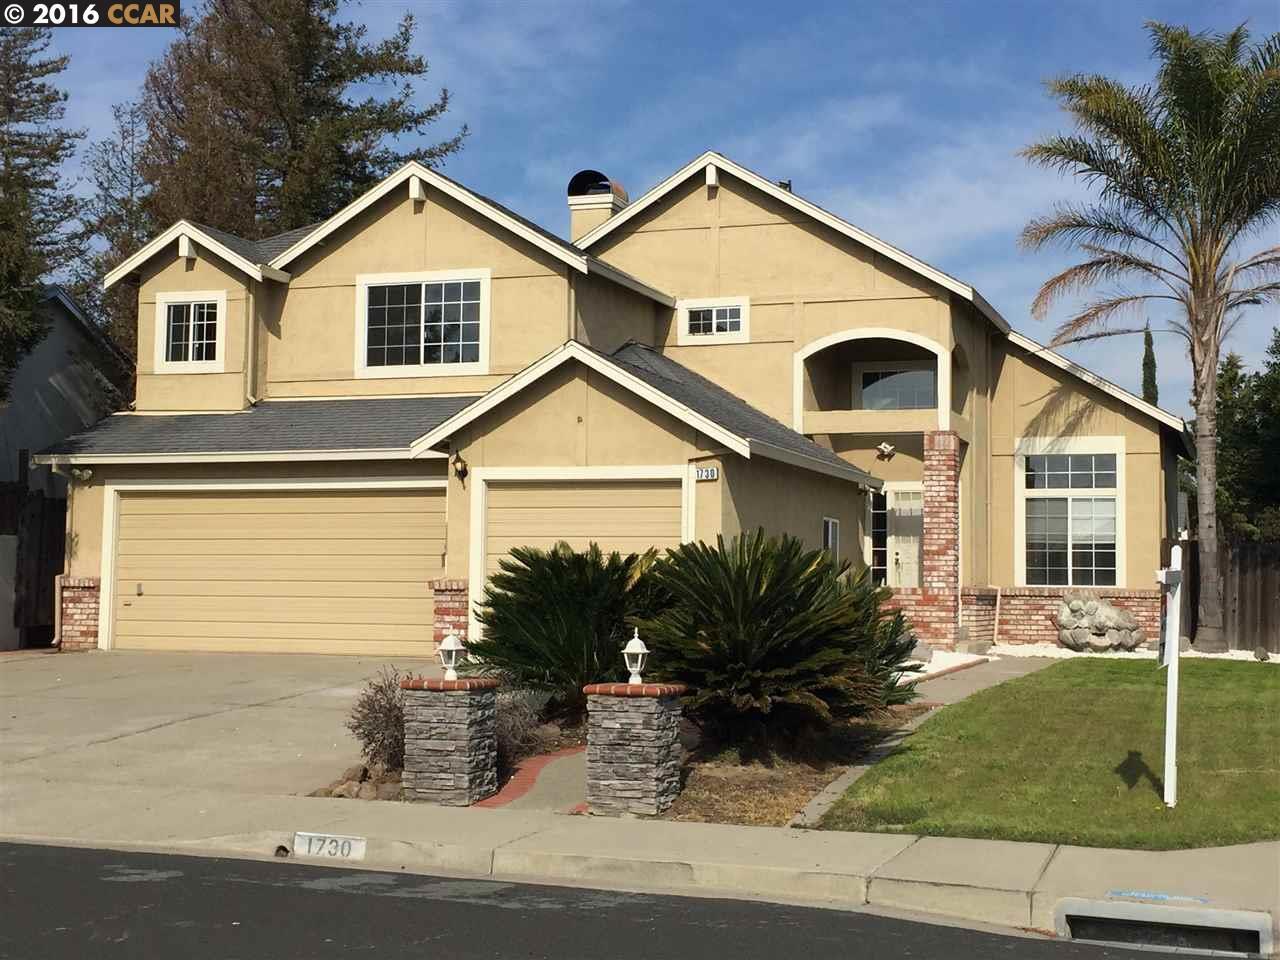 1730 Domaine Way, Oakley, CA